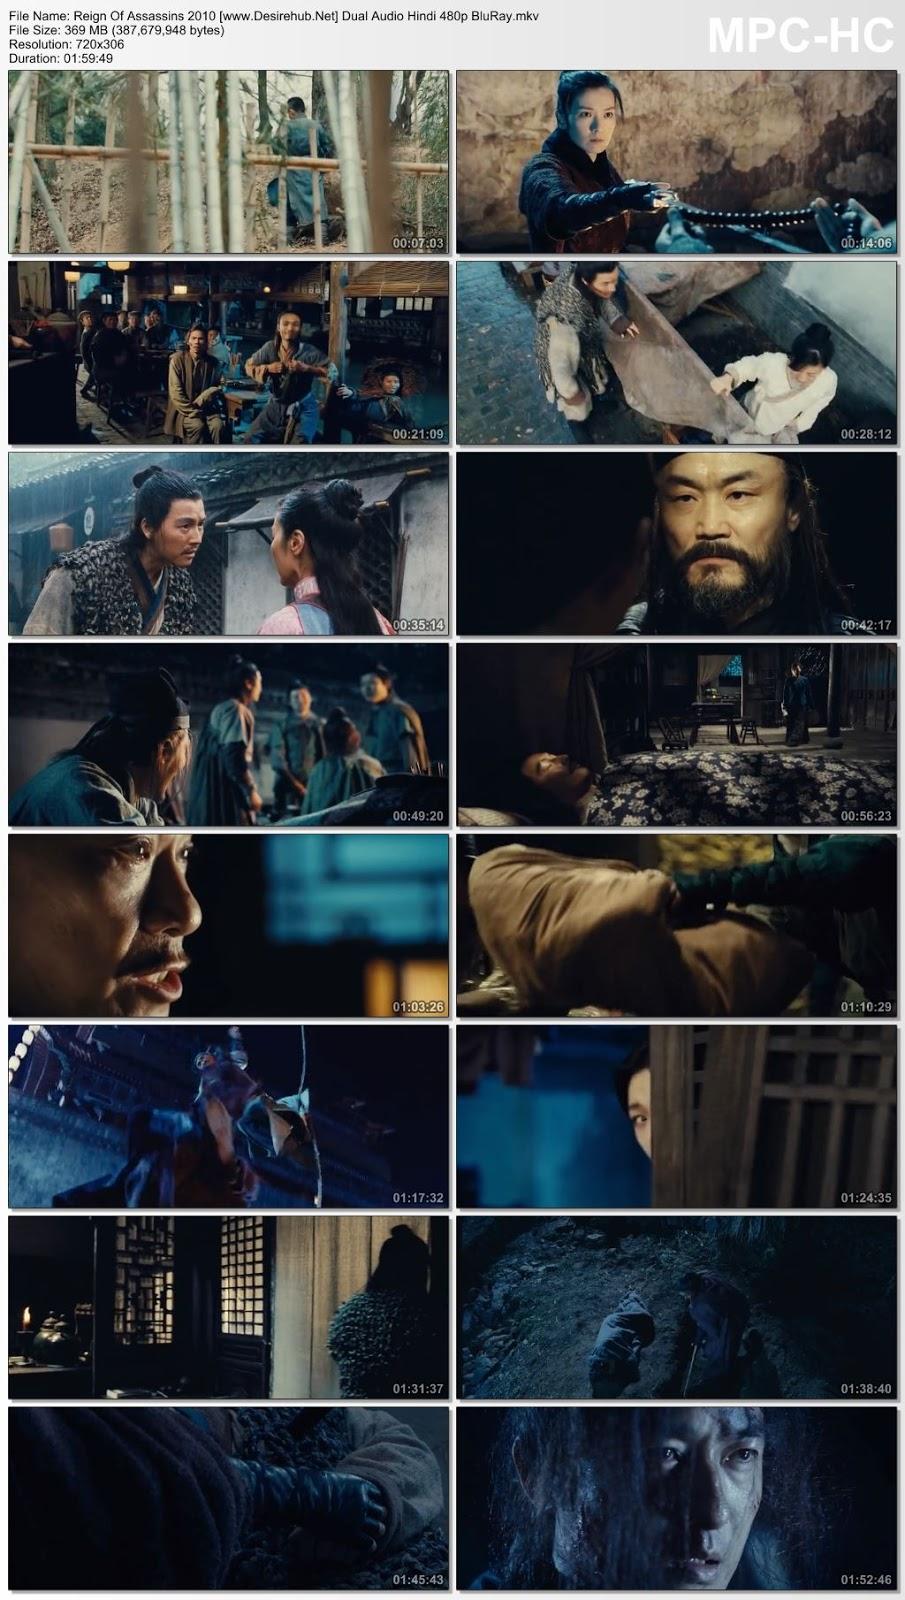 Reign Of Assassins 2010 Dual Audio Hindi 480p BluRay 350MB Desirehub